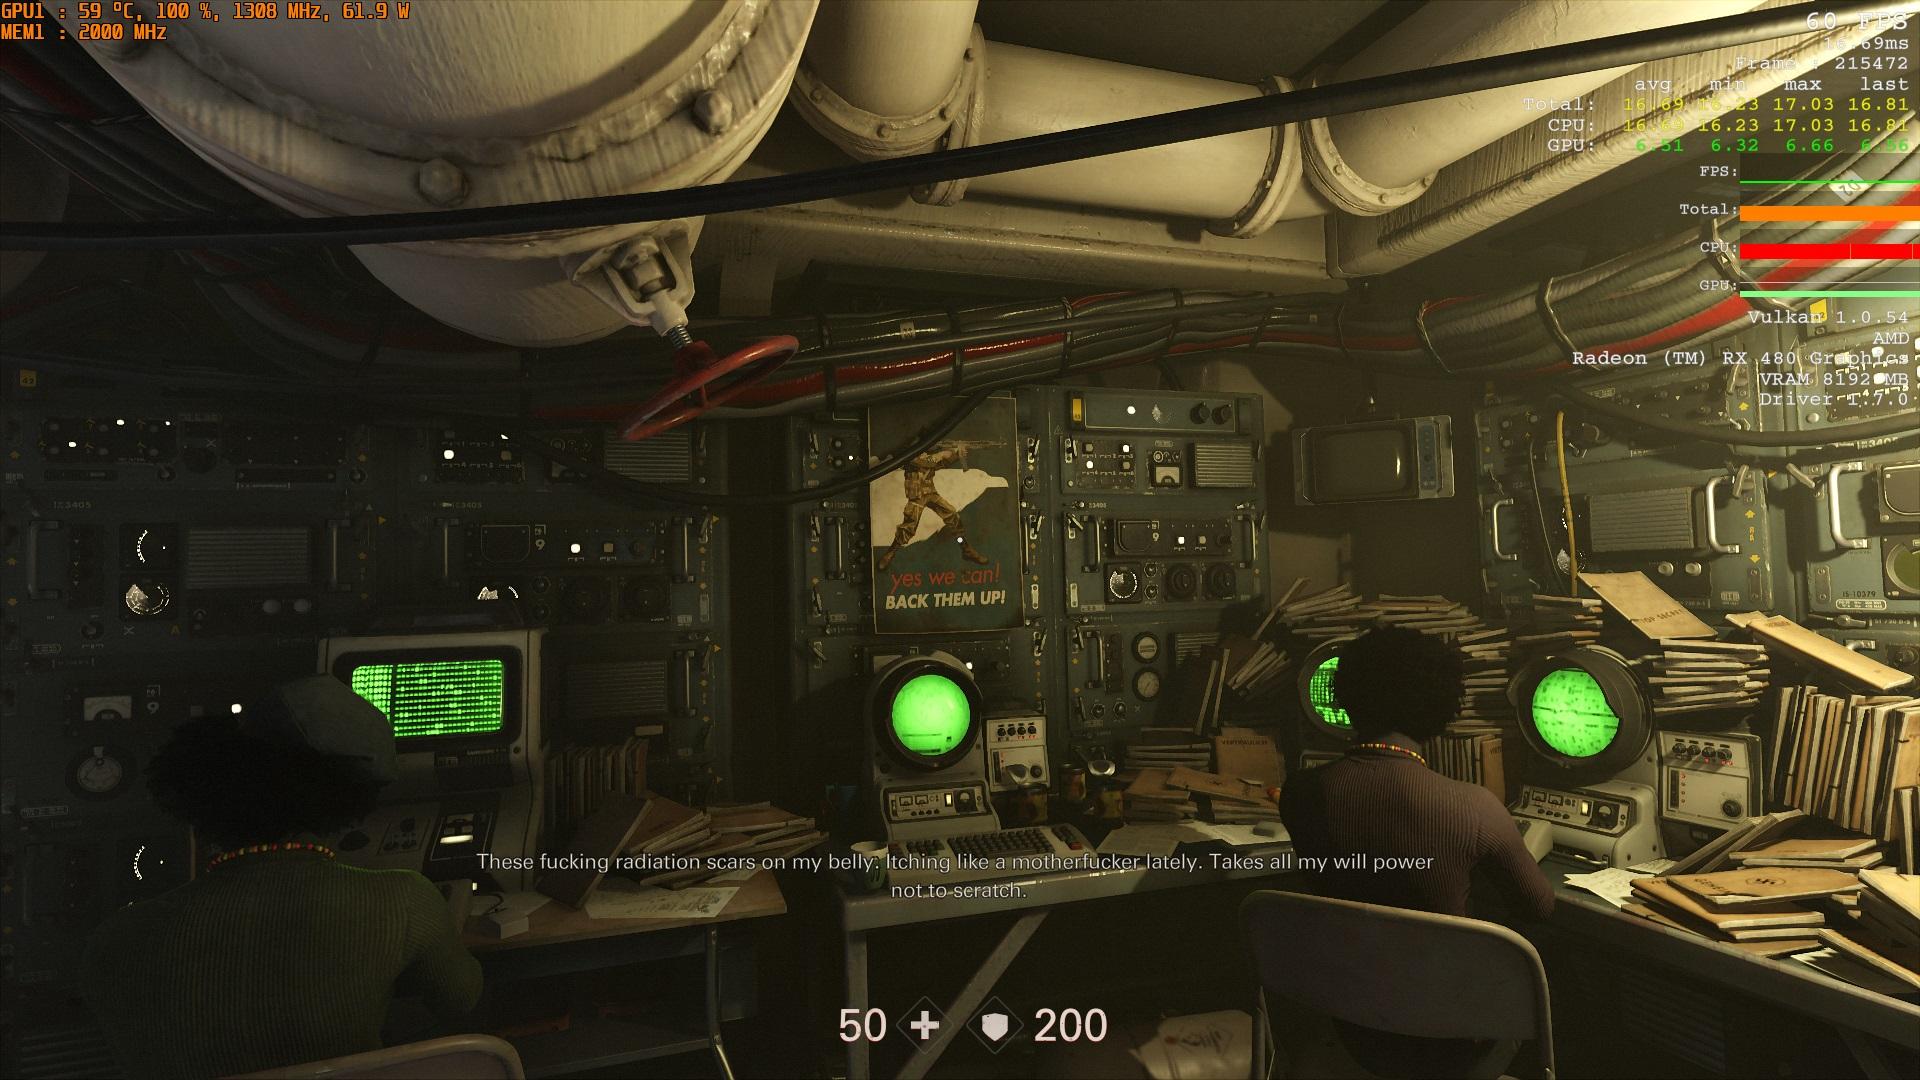 IndianVideoGamer » Wolfenstein II PC performance impressions | IVG